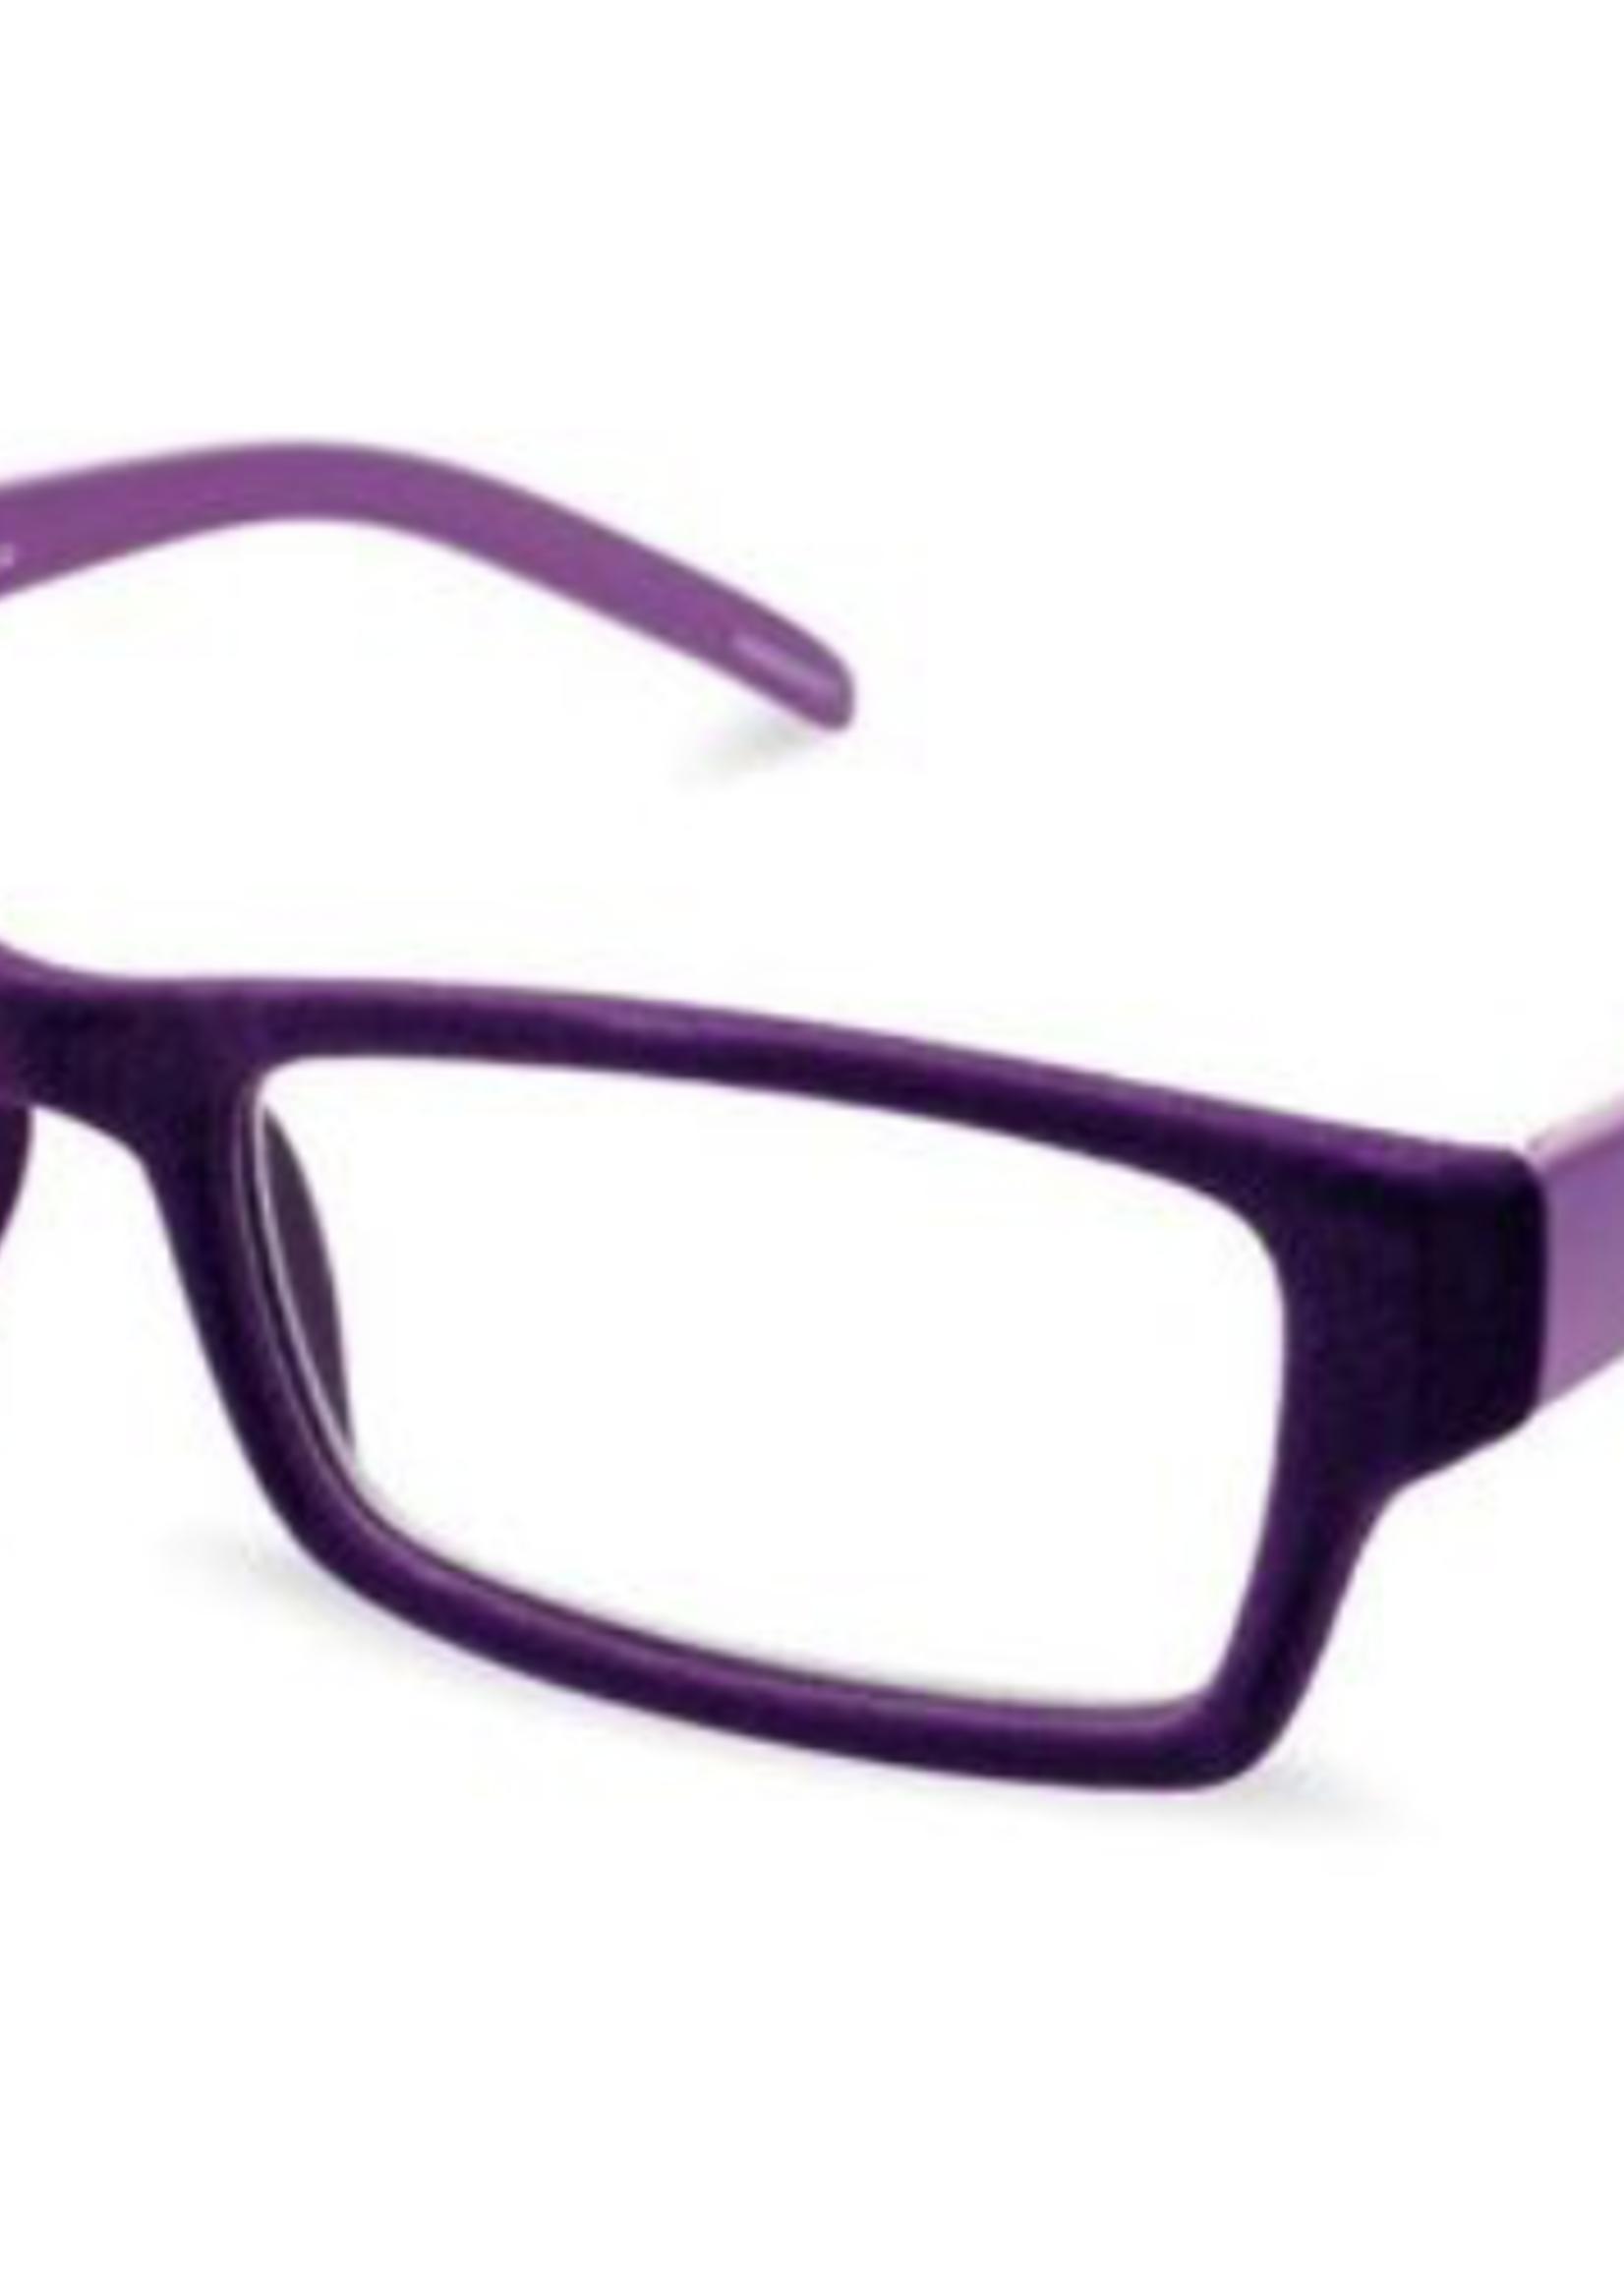 Scojo Scojo Gels Plush Plum Pizzazz Purple